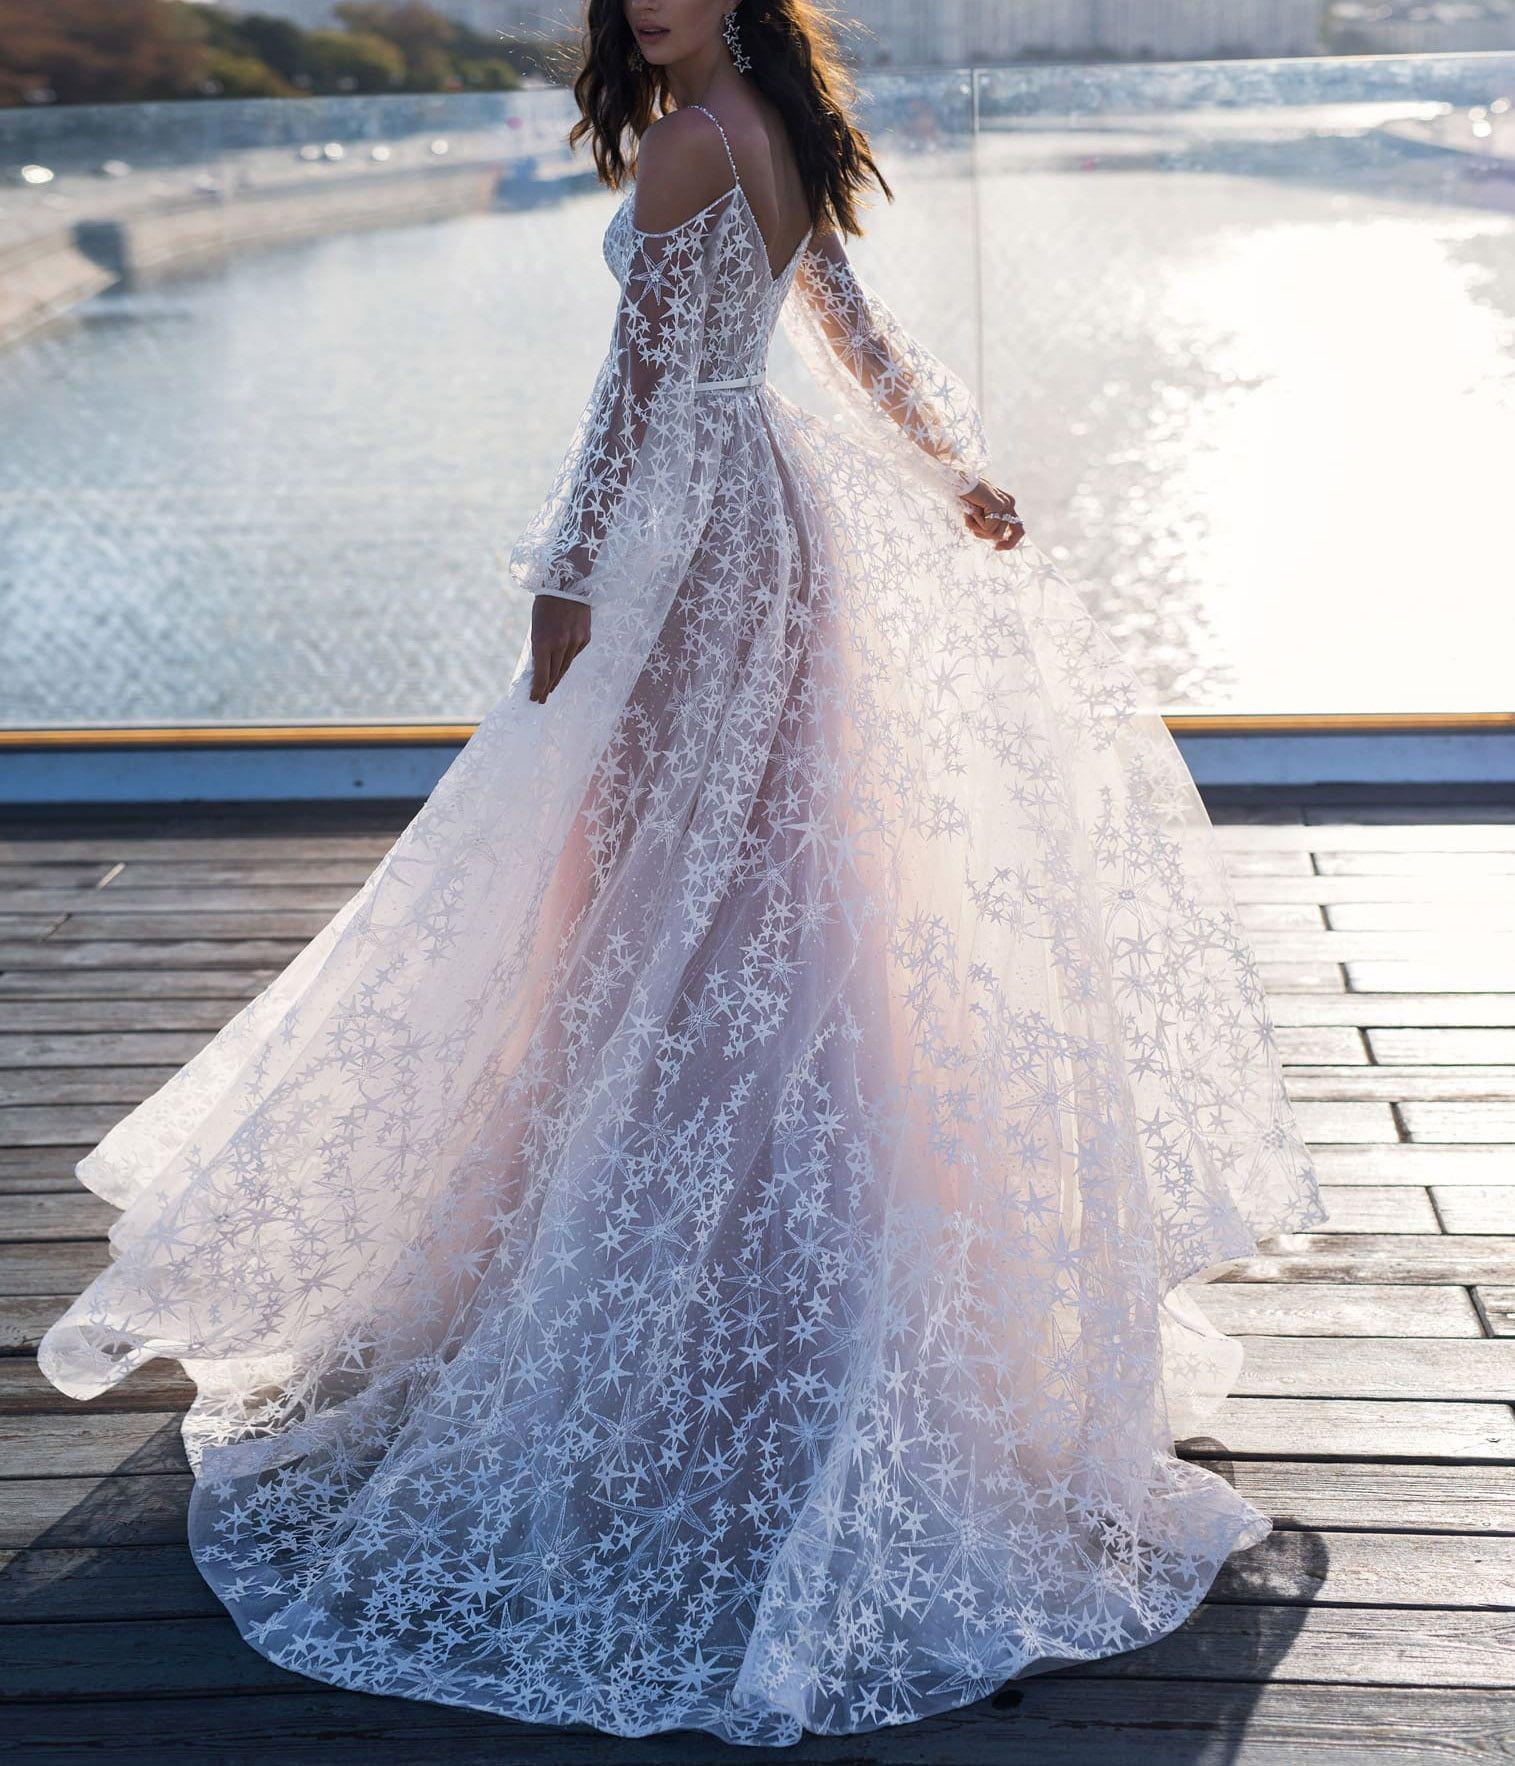 Elegant Star Appliques Chic Wedding Dress Boho Bridal Dress Cheap Wedding Dress Wedding Dress Long Sleeve [ 1766 x 1515 Pixel ]